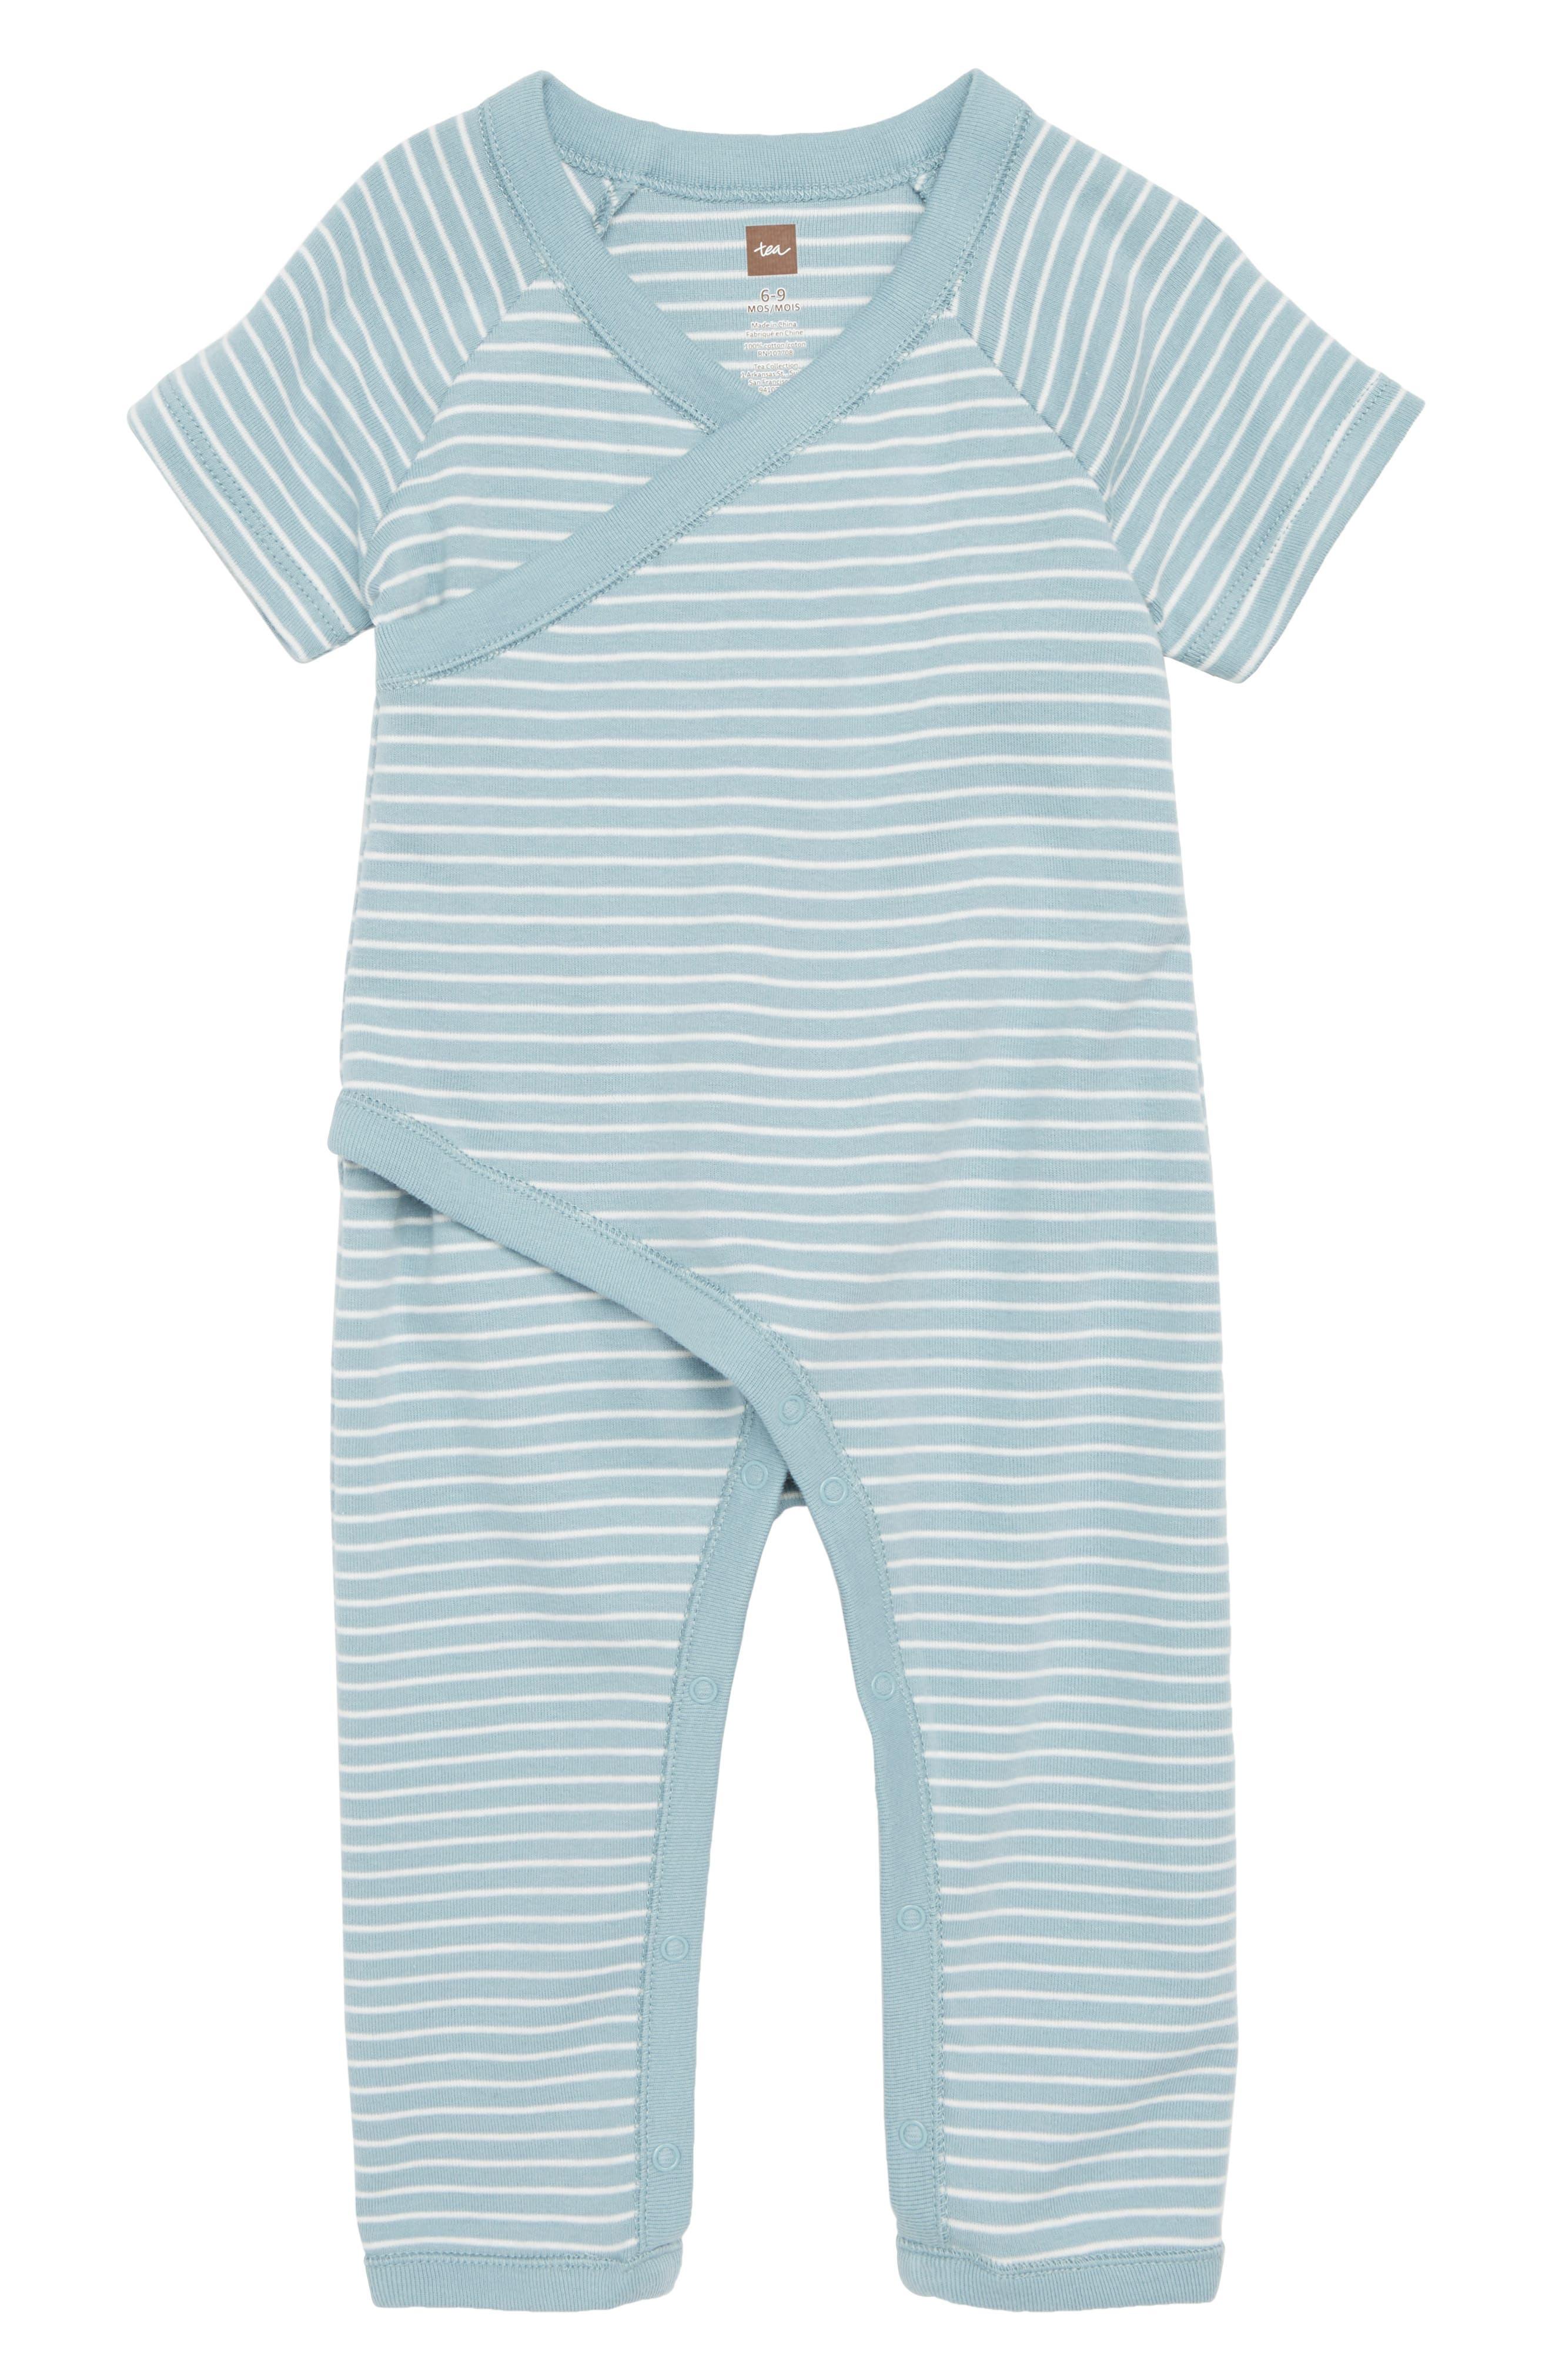 Tea Collection Stripe Wrap Romper (Baby)